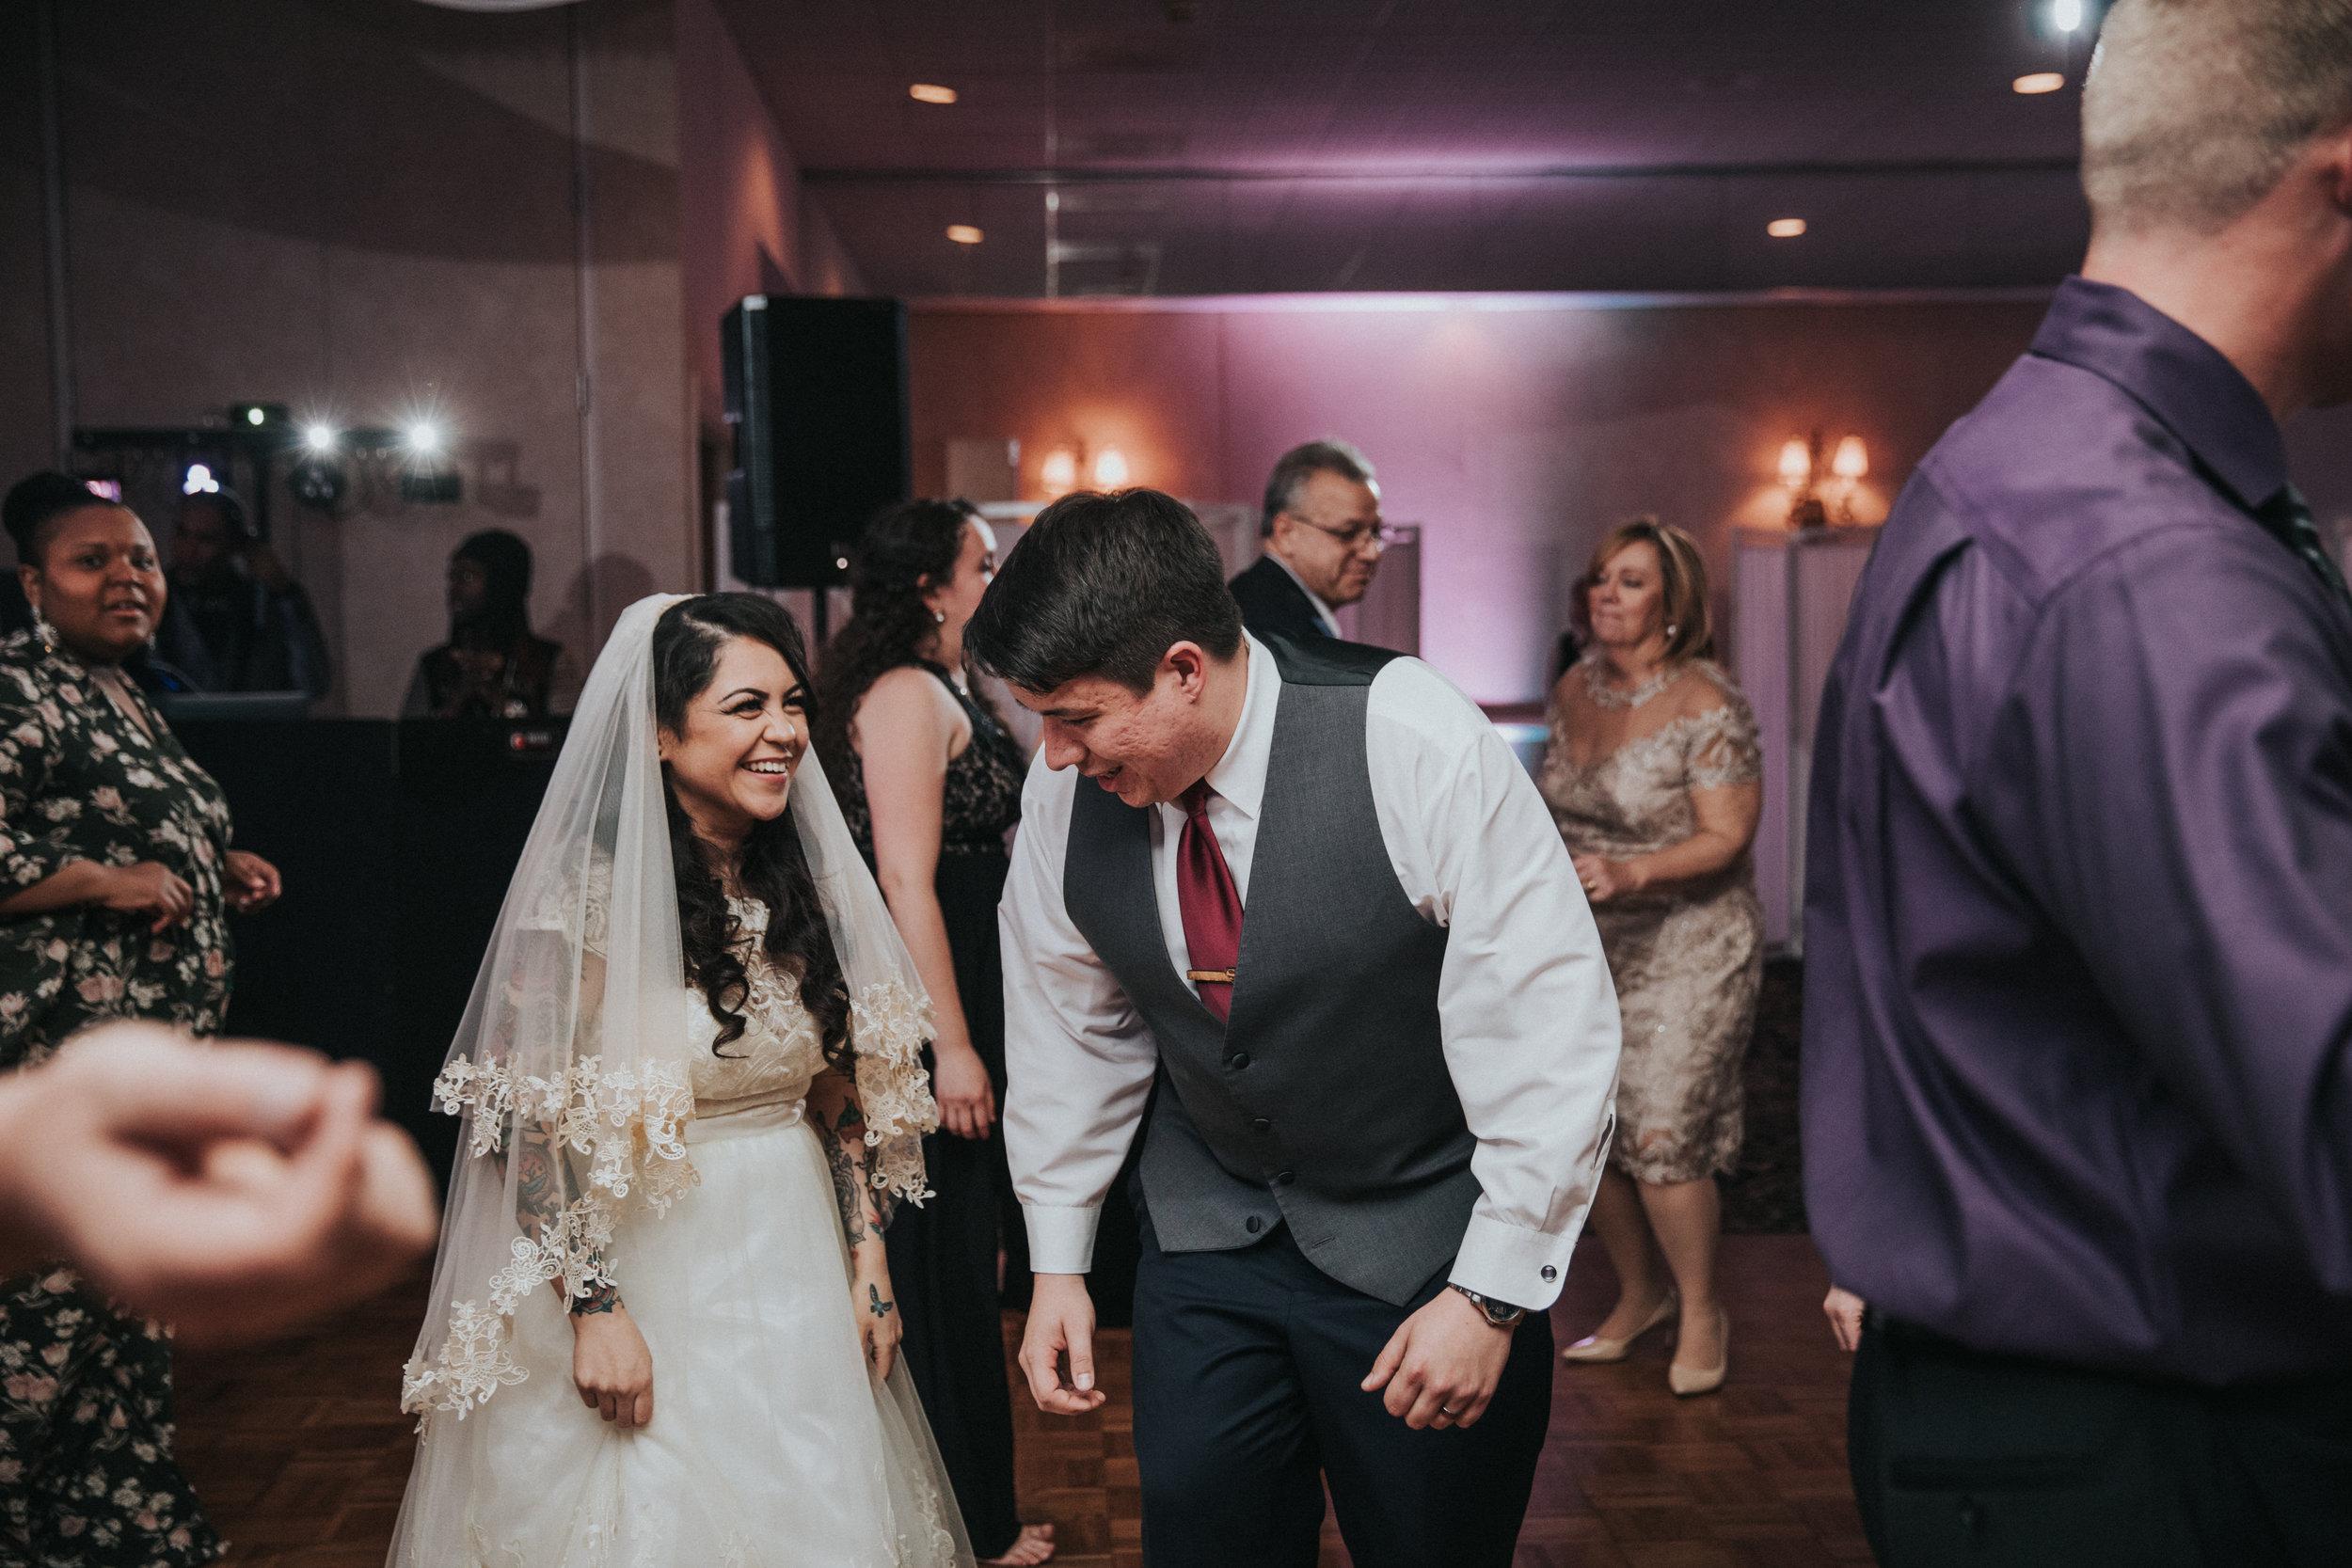 New-Jersey-Wedding-Photographer-ReceptionCenter-Valeria&Mike-Reception (203 of 265).jpg